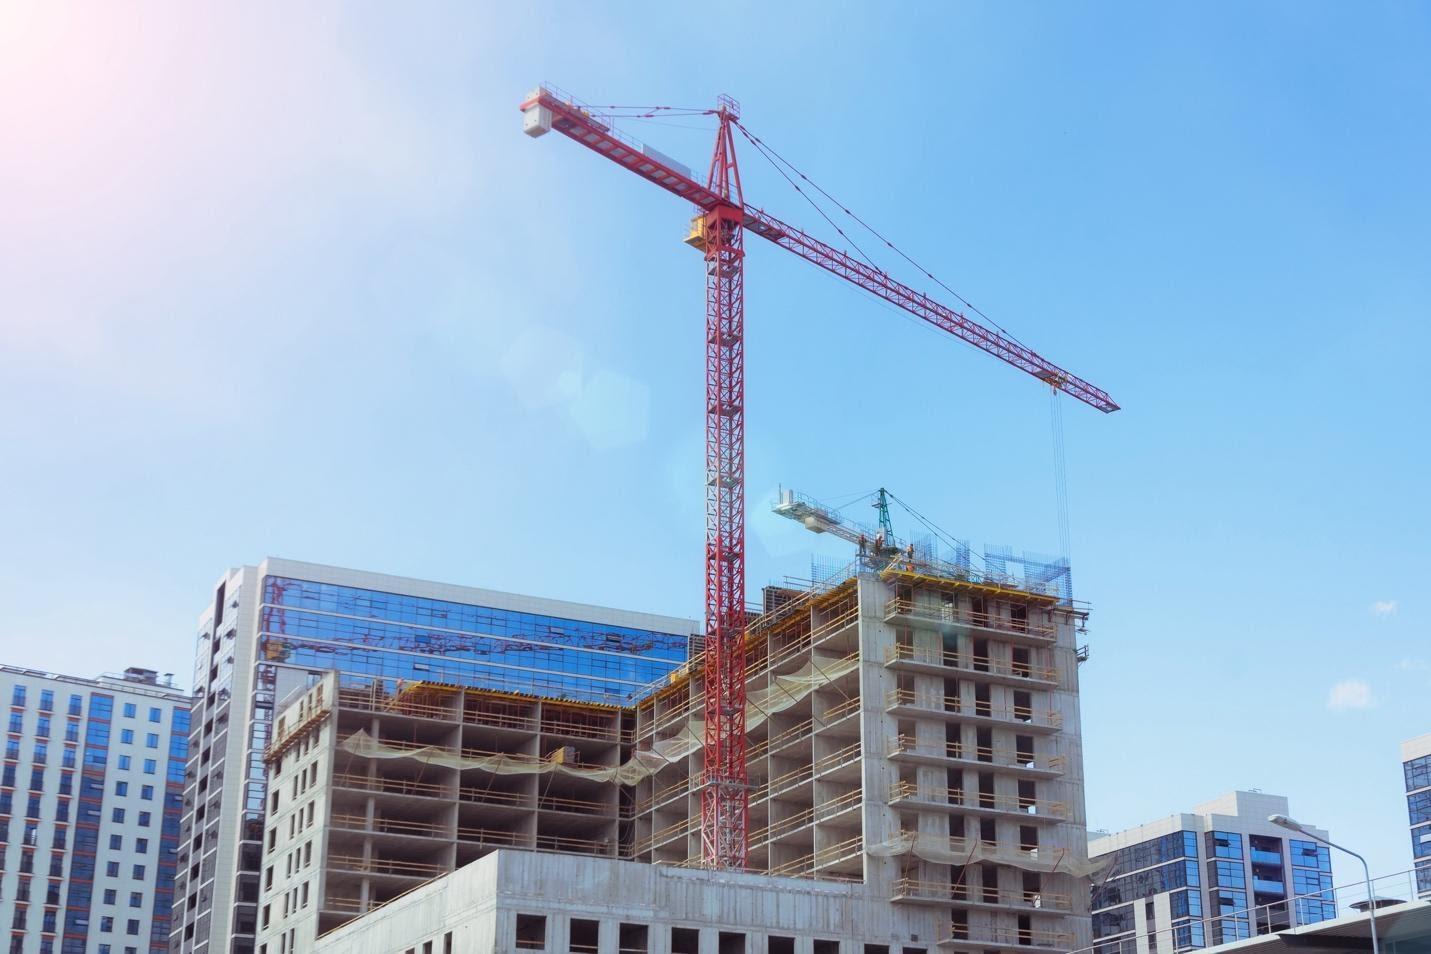 Crane constructing a commercial building